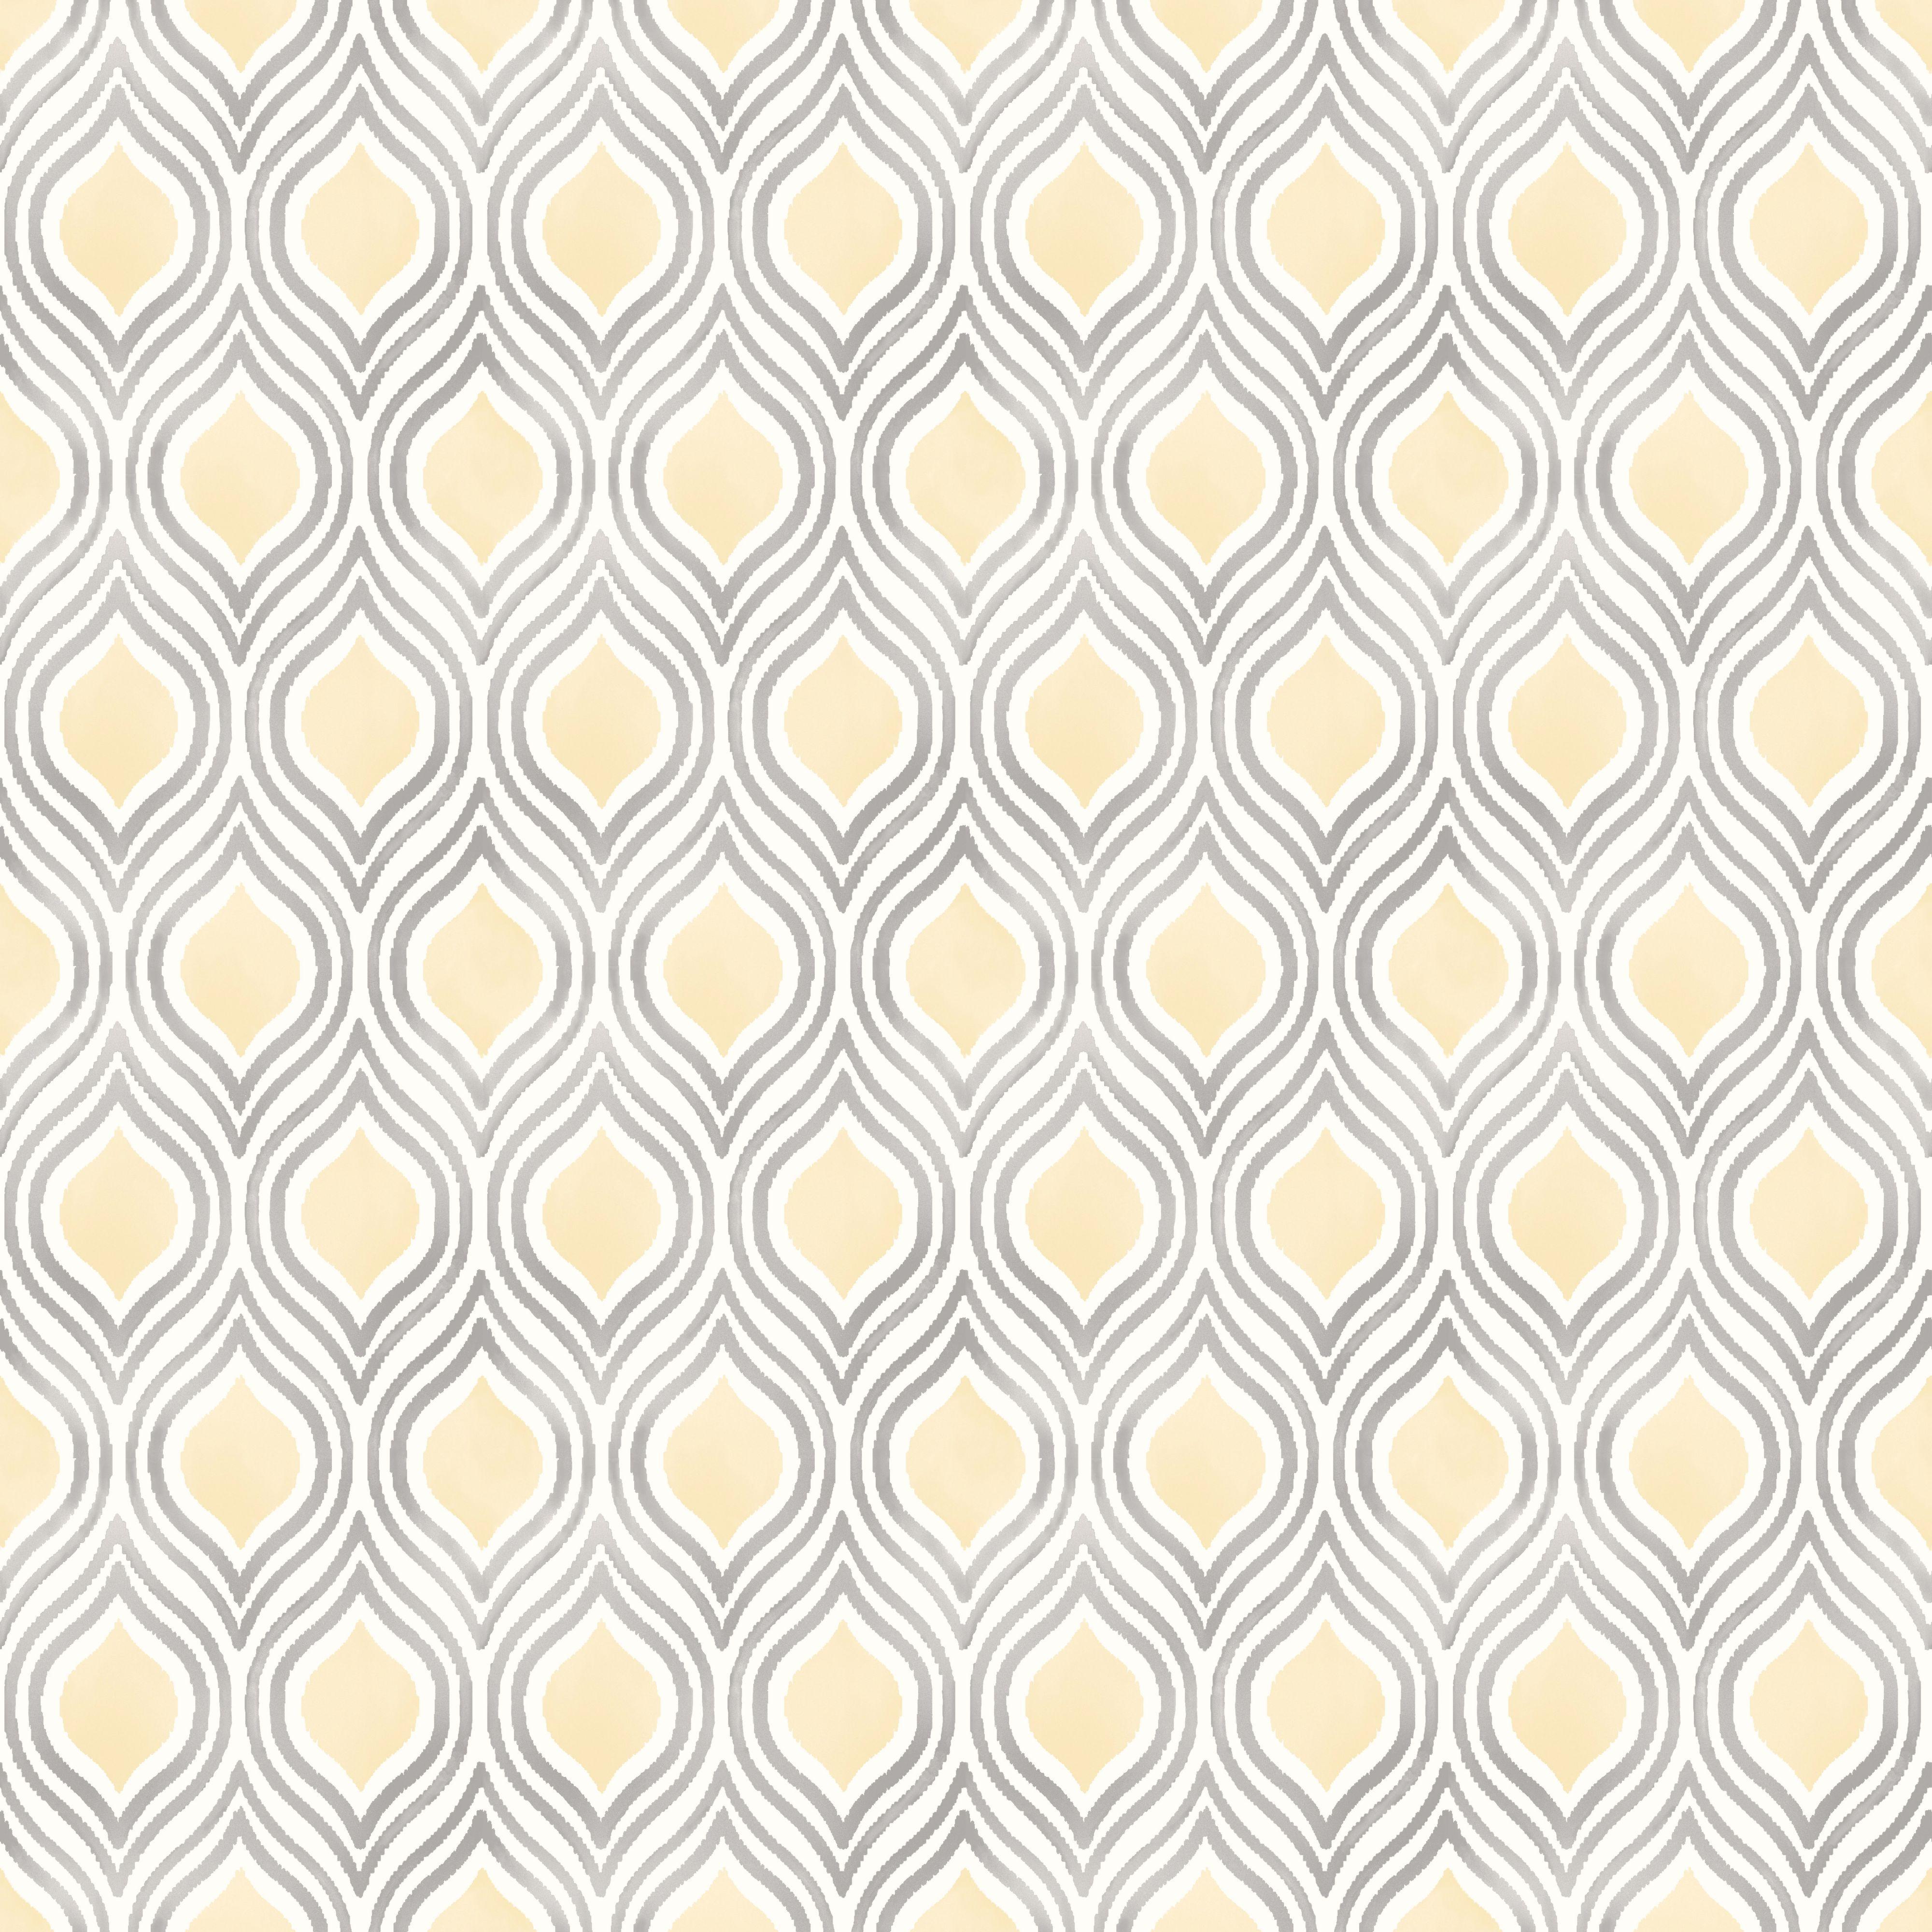 Ailsa Soft Lemon Geometric Wallpaper Departments Diy At B Q